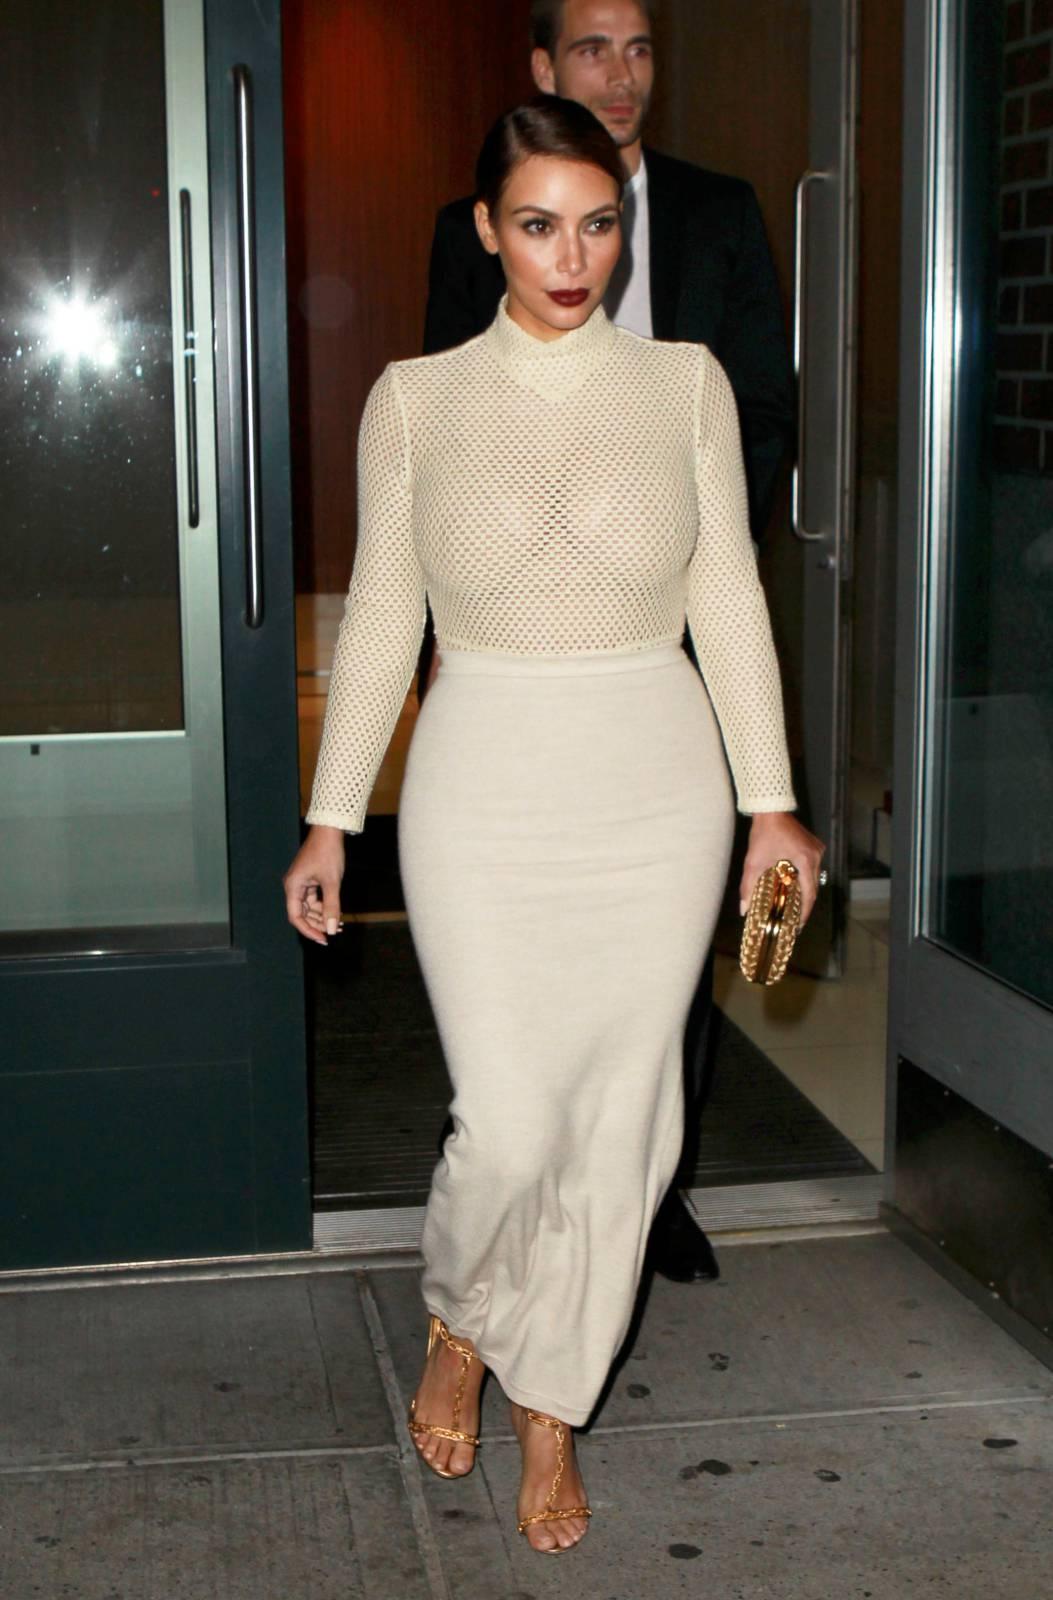 904204200_Kim_Kardashian_191113_ReSiDuO4_123_539lo.jpg